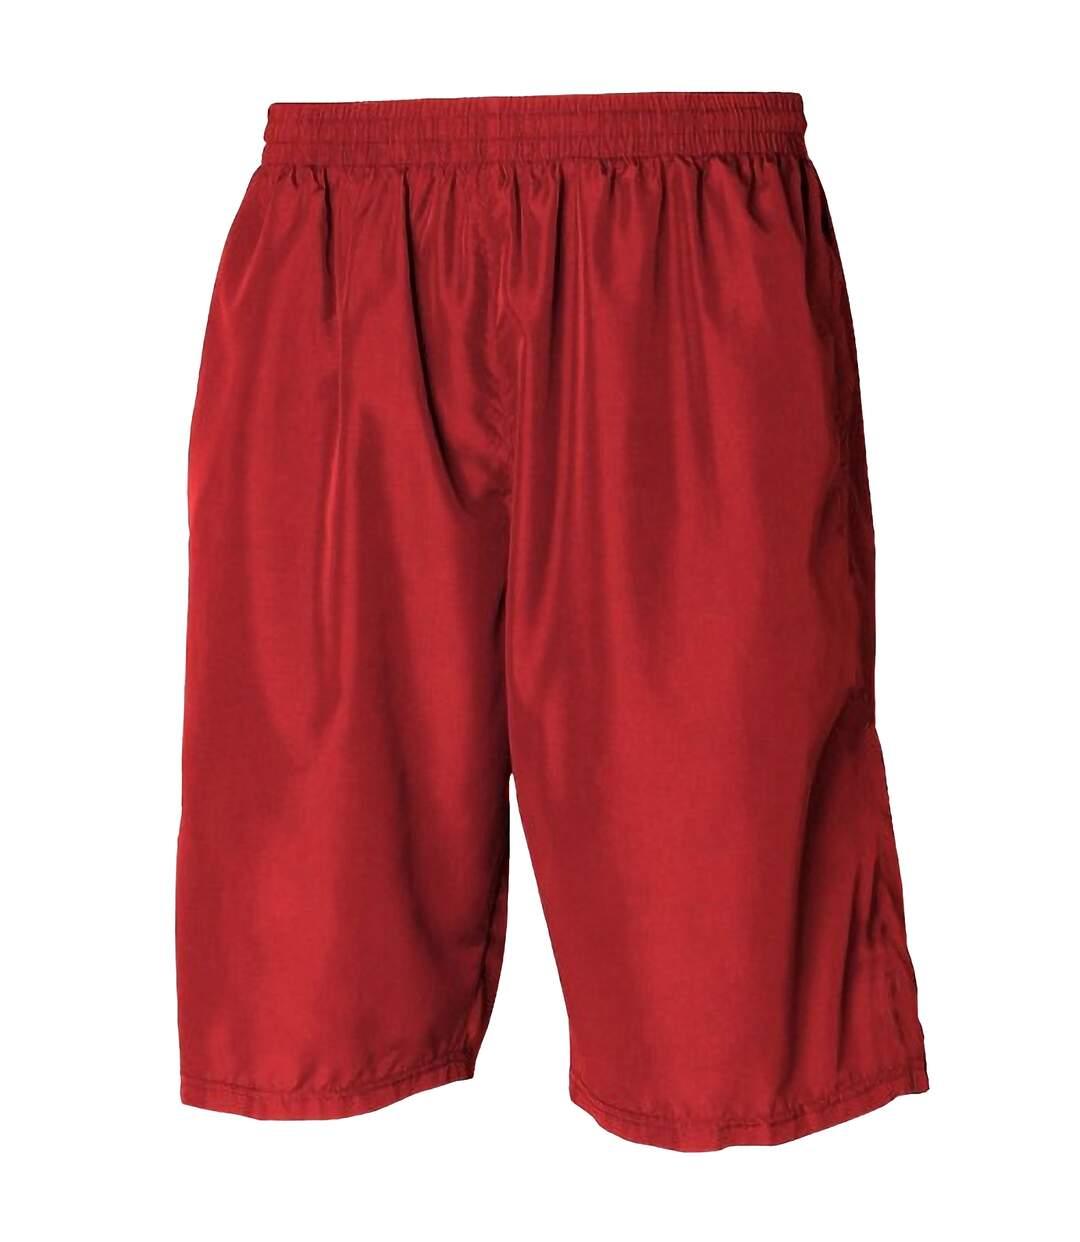 Tombo Teamsport Mens Teamwear All Purpose Longline Lined Sports Short (Navy/White) - UTRW1571